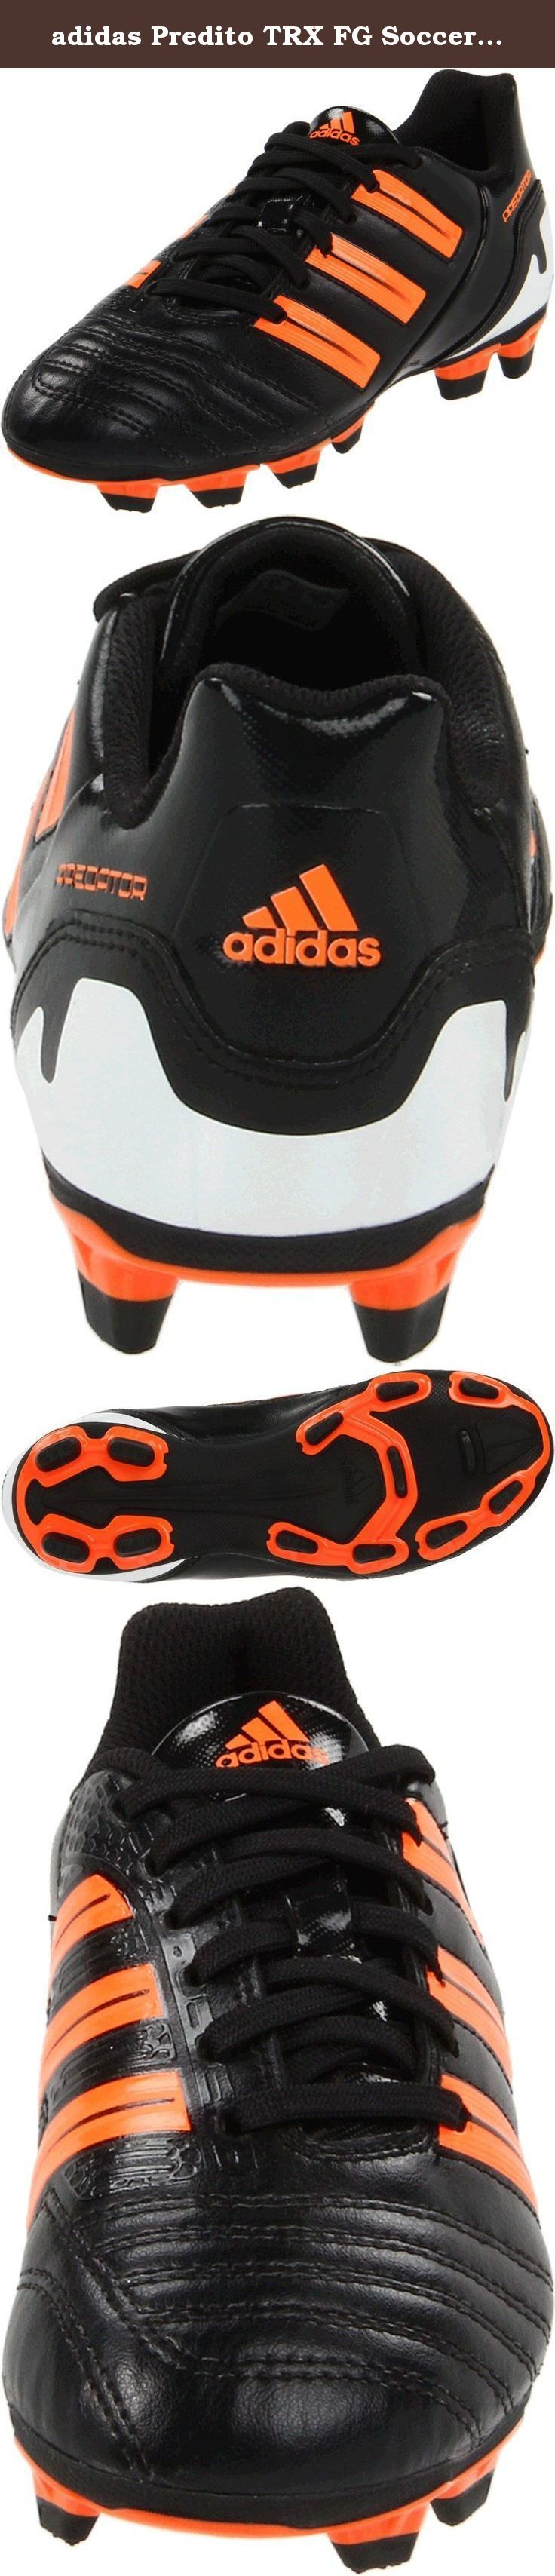 adidas Predito TRX FG Soccer Cleat (Toddler/Little Kid/Big Kid),Black/Warning/White,6 M US Big Kid.